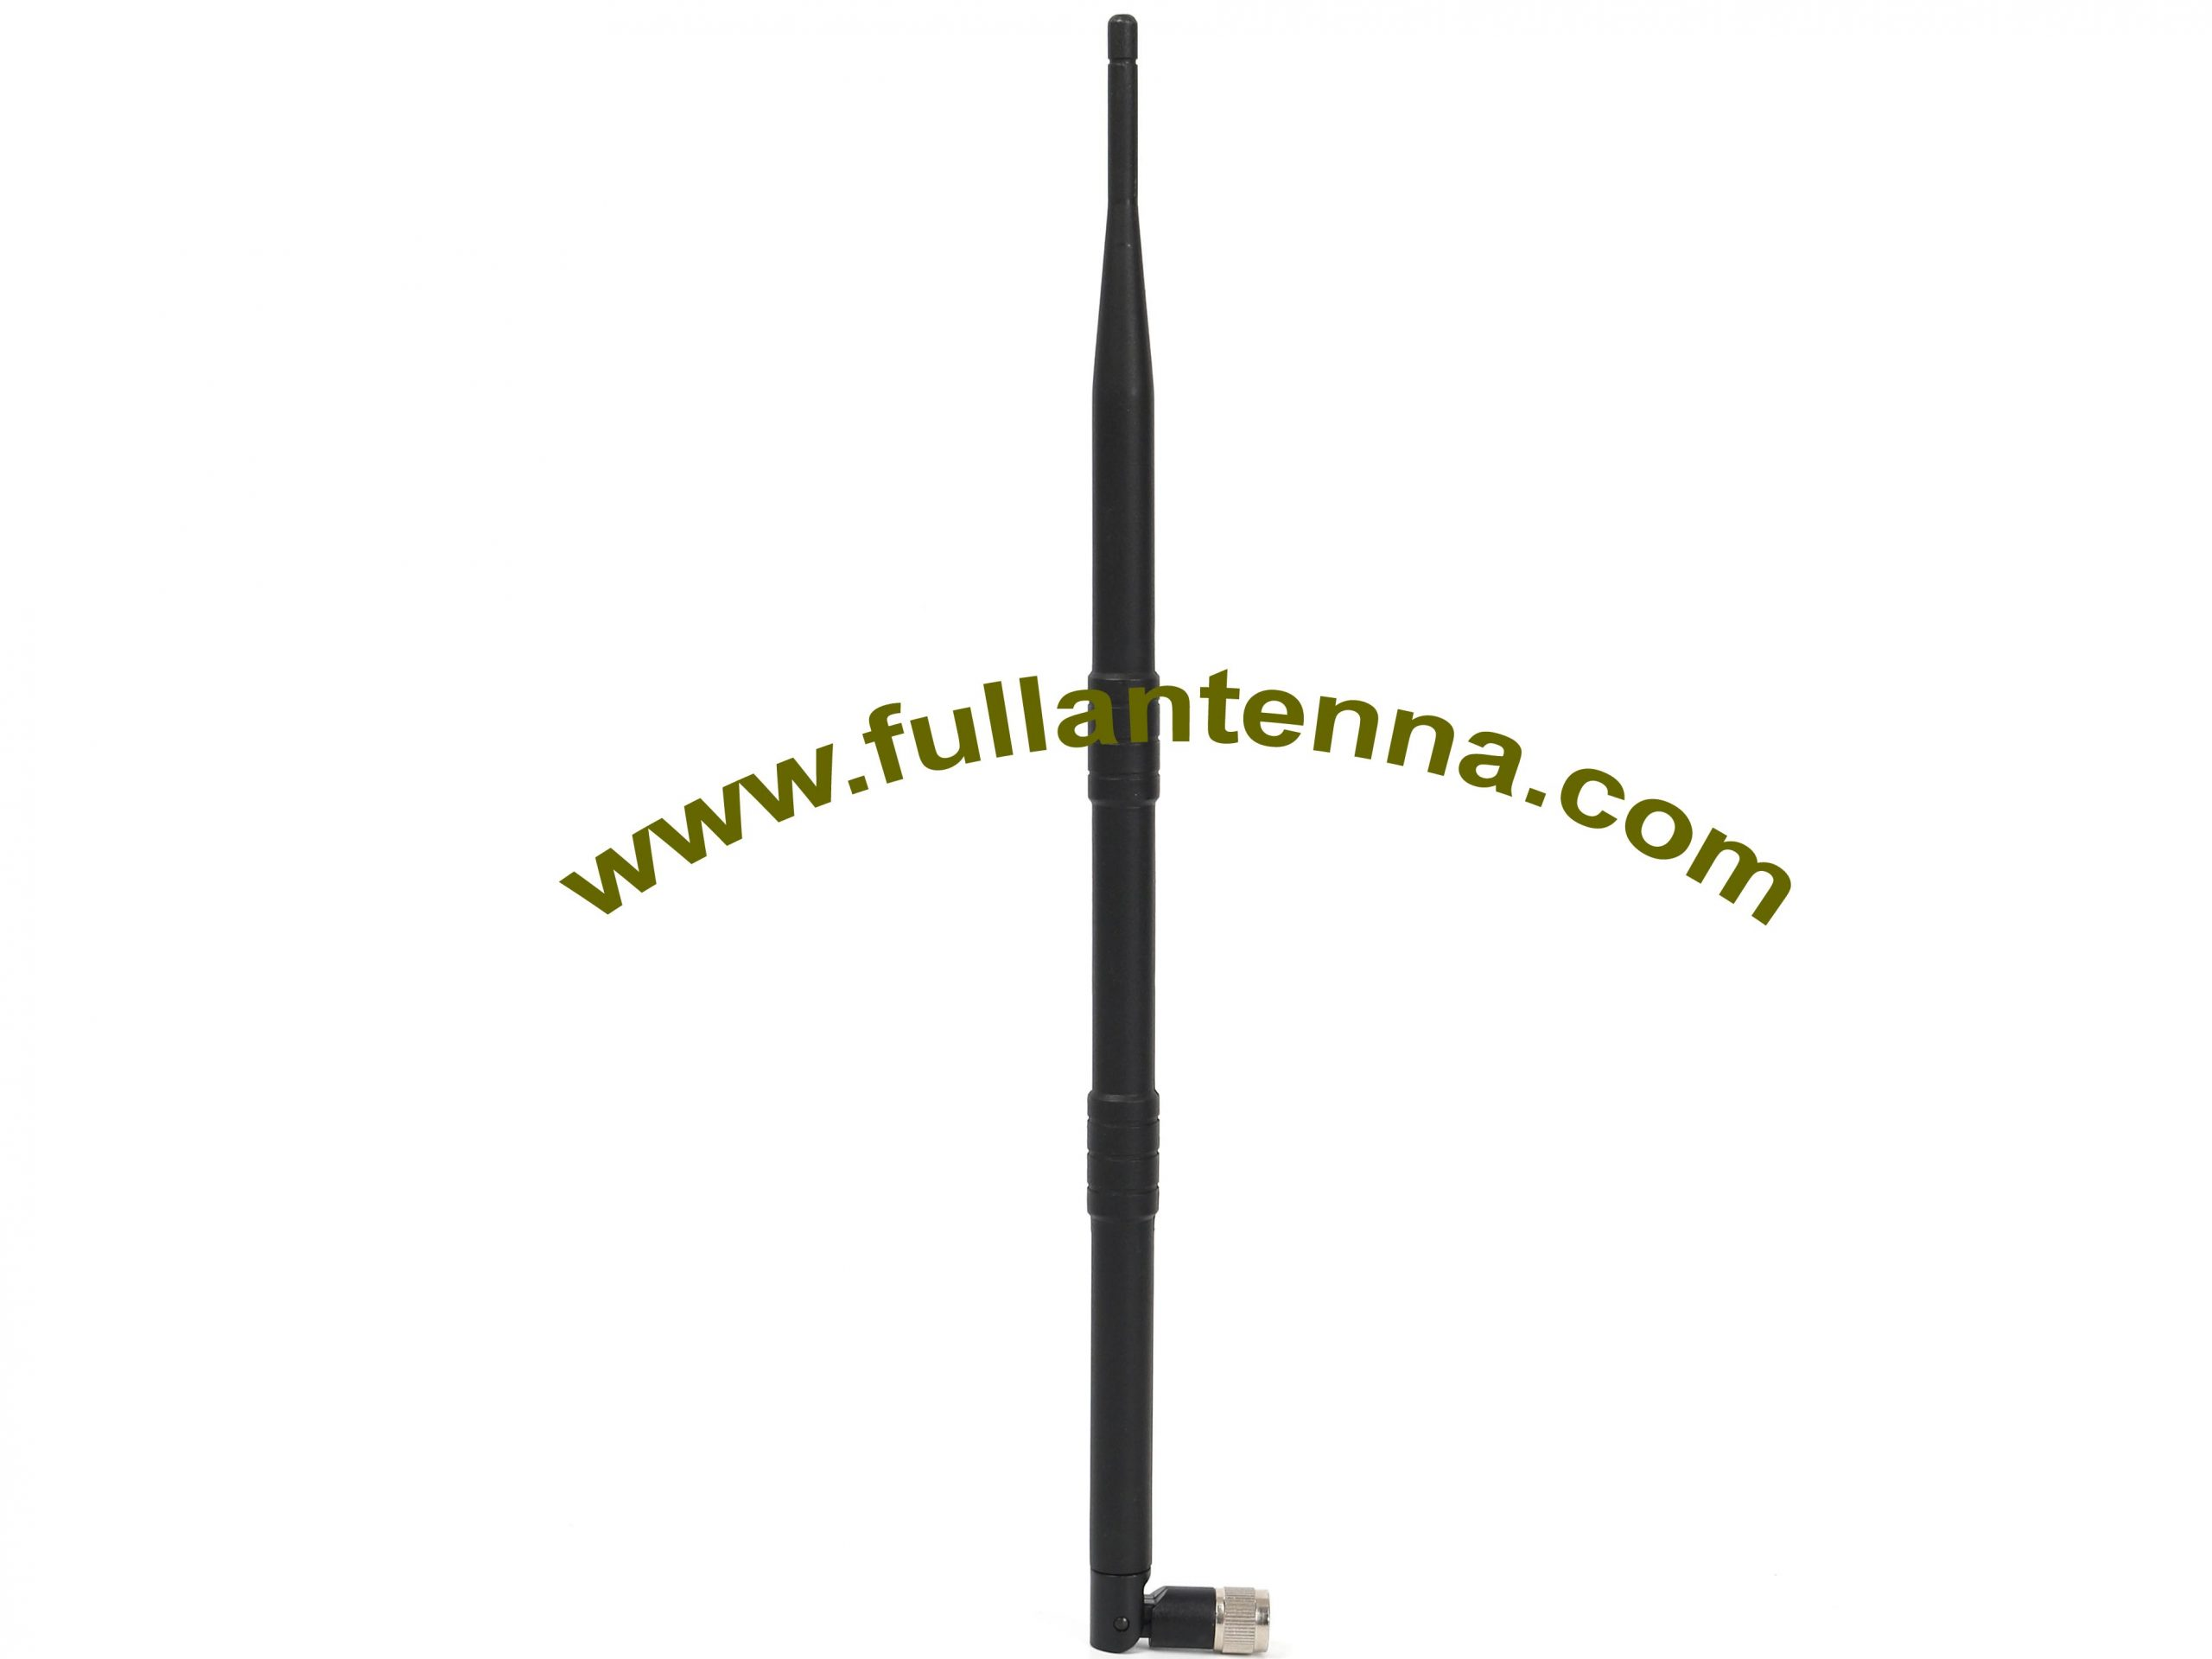 P/N:FA2400.0510,WiFi/2.4G Rubber Antenna,2400-2500mhz frequency 10dbi gain